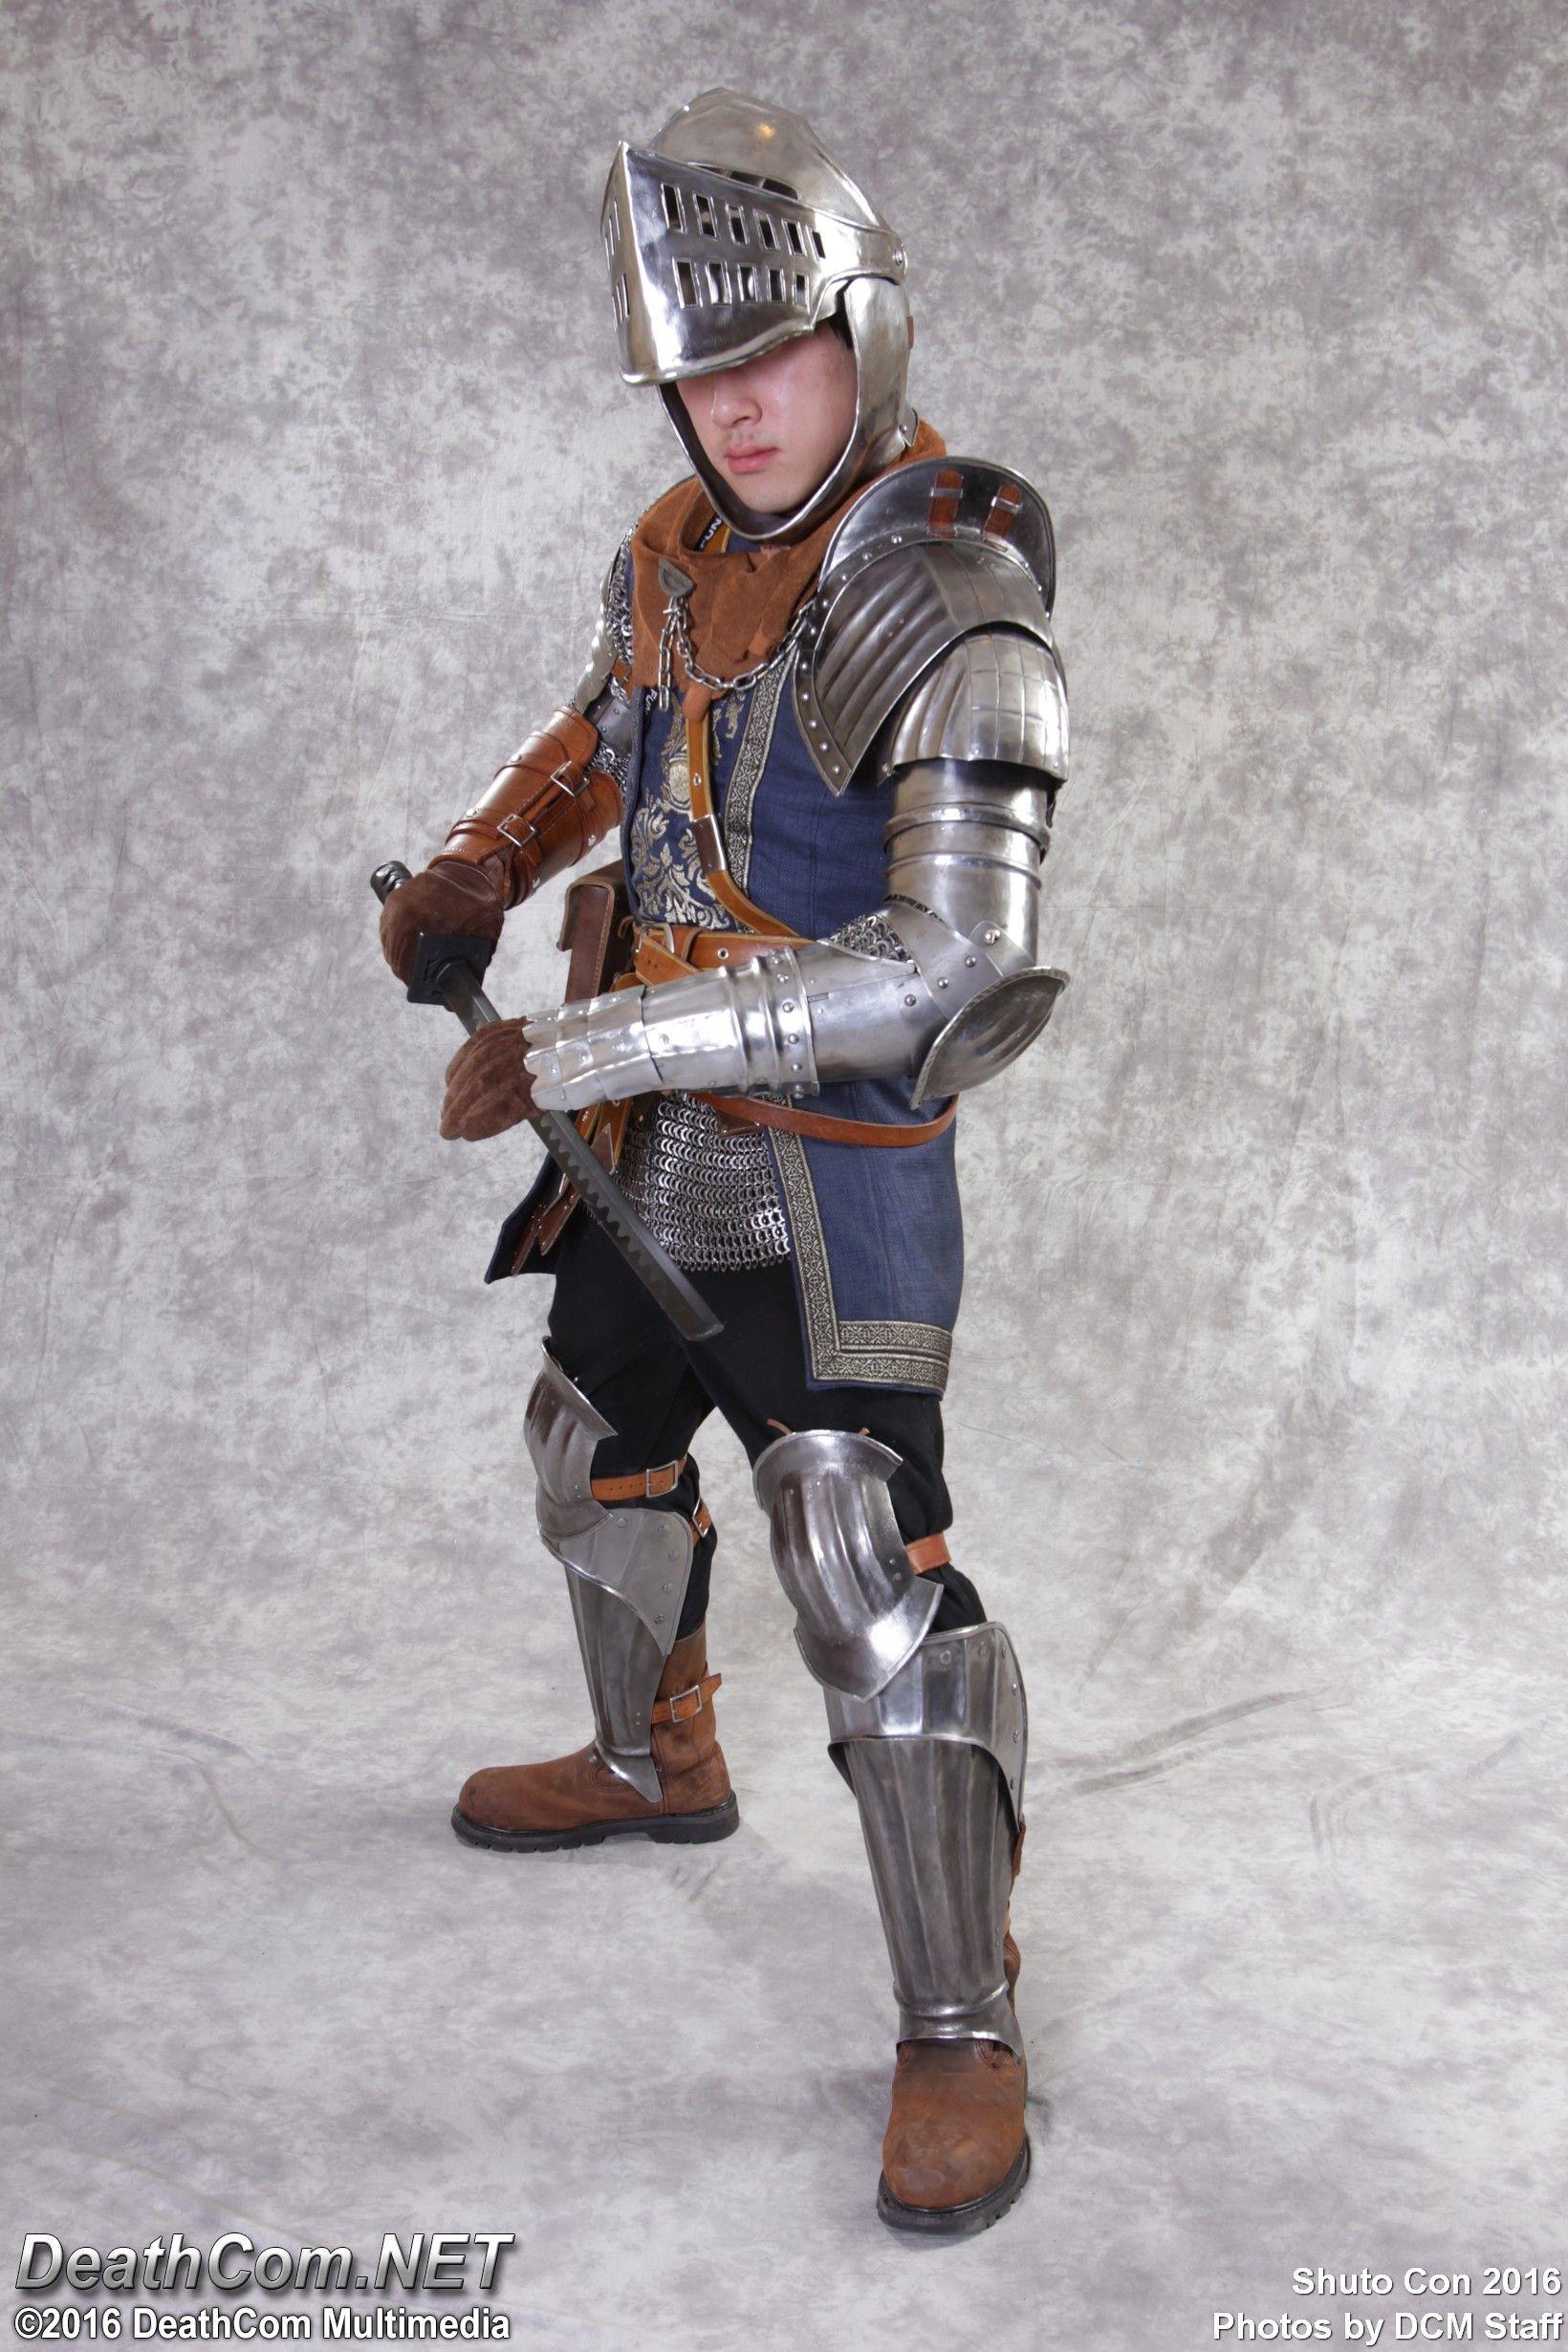 CRS260 cosplay of Oscar, Knight of Astora from Dark Souls